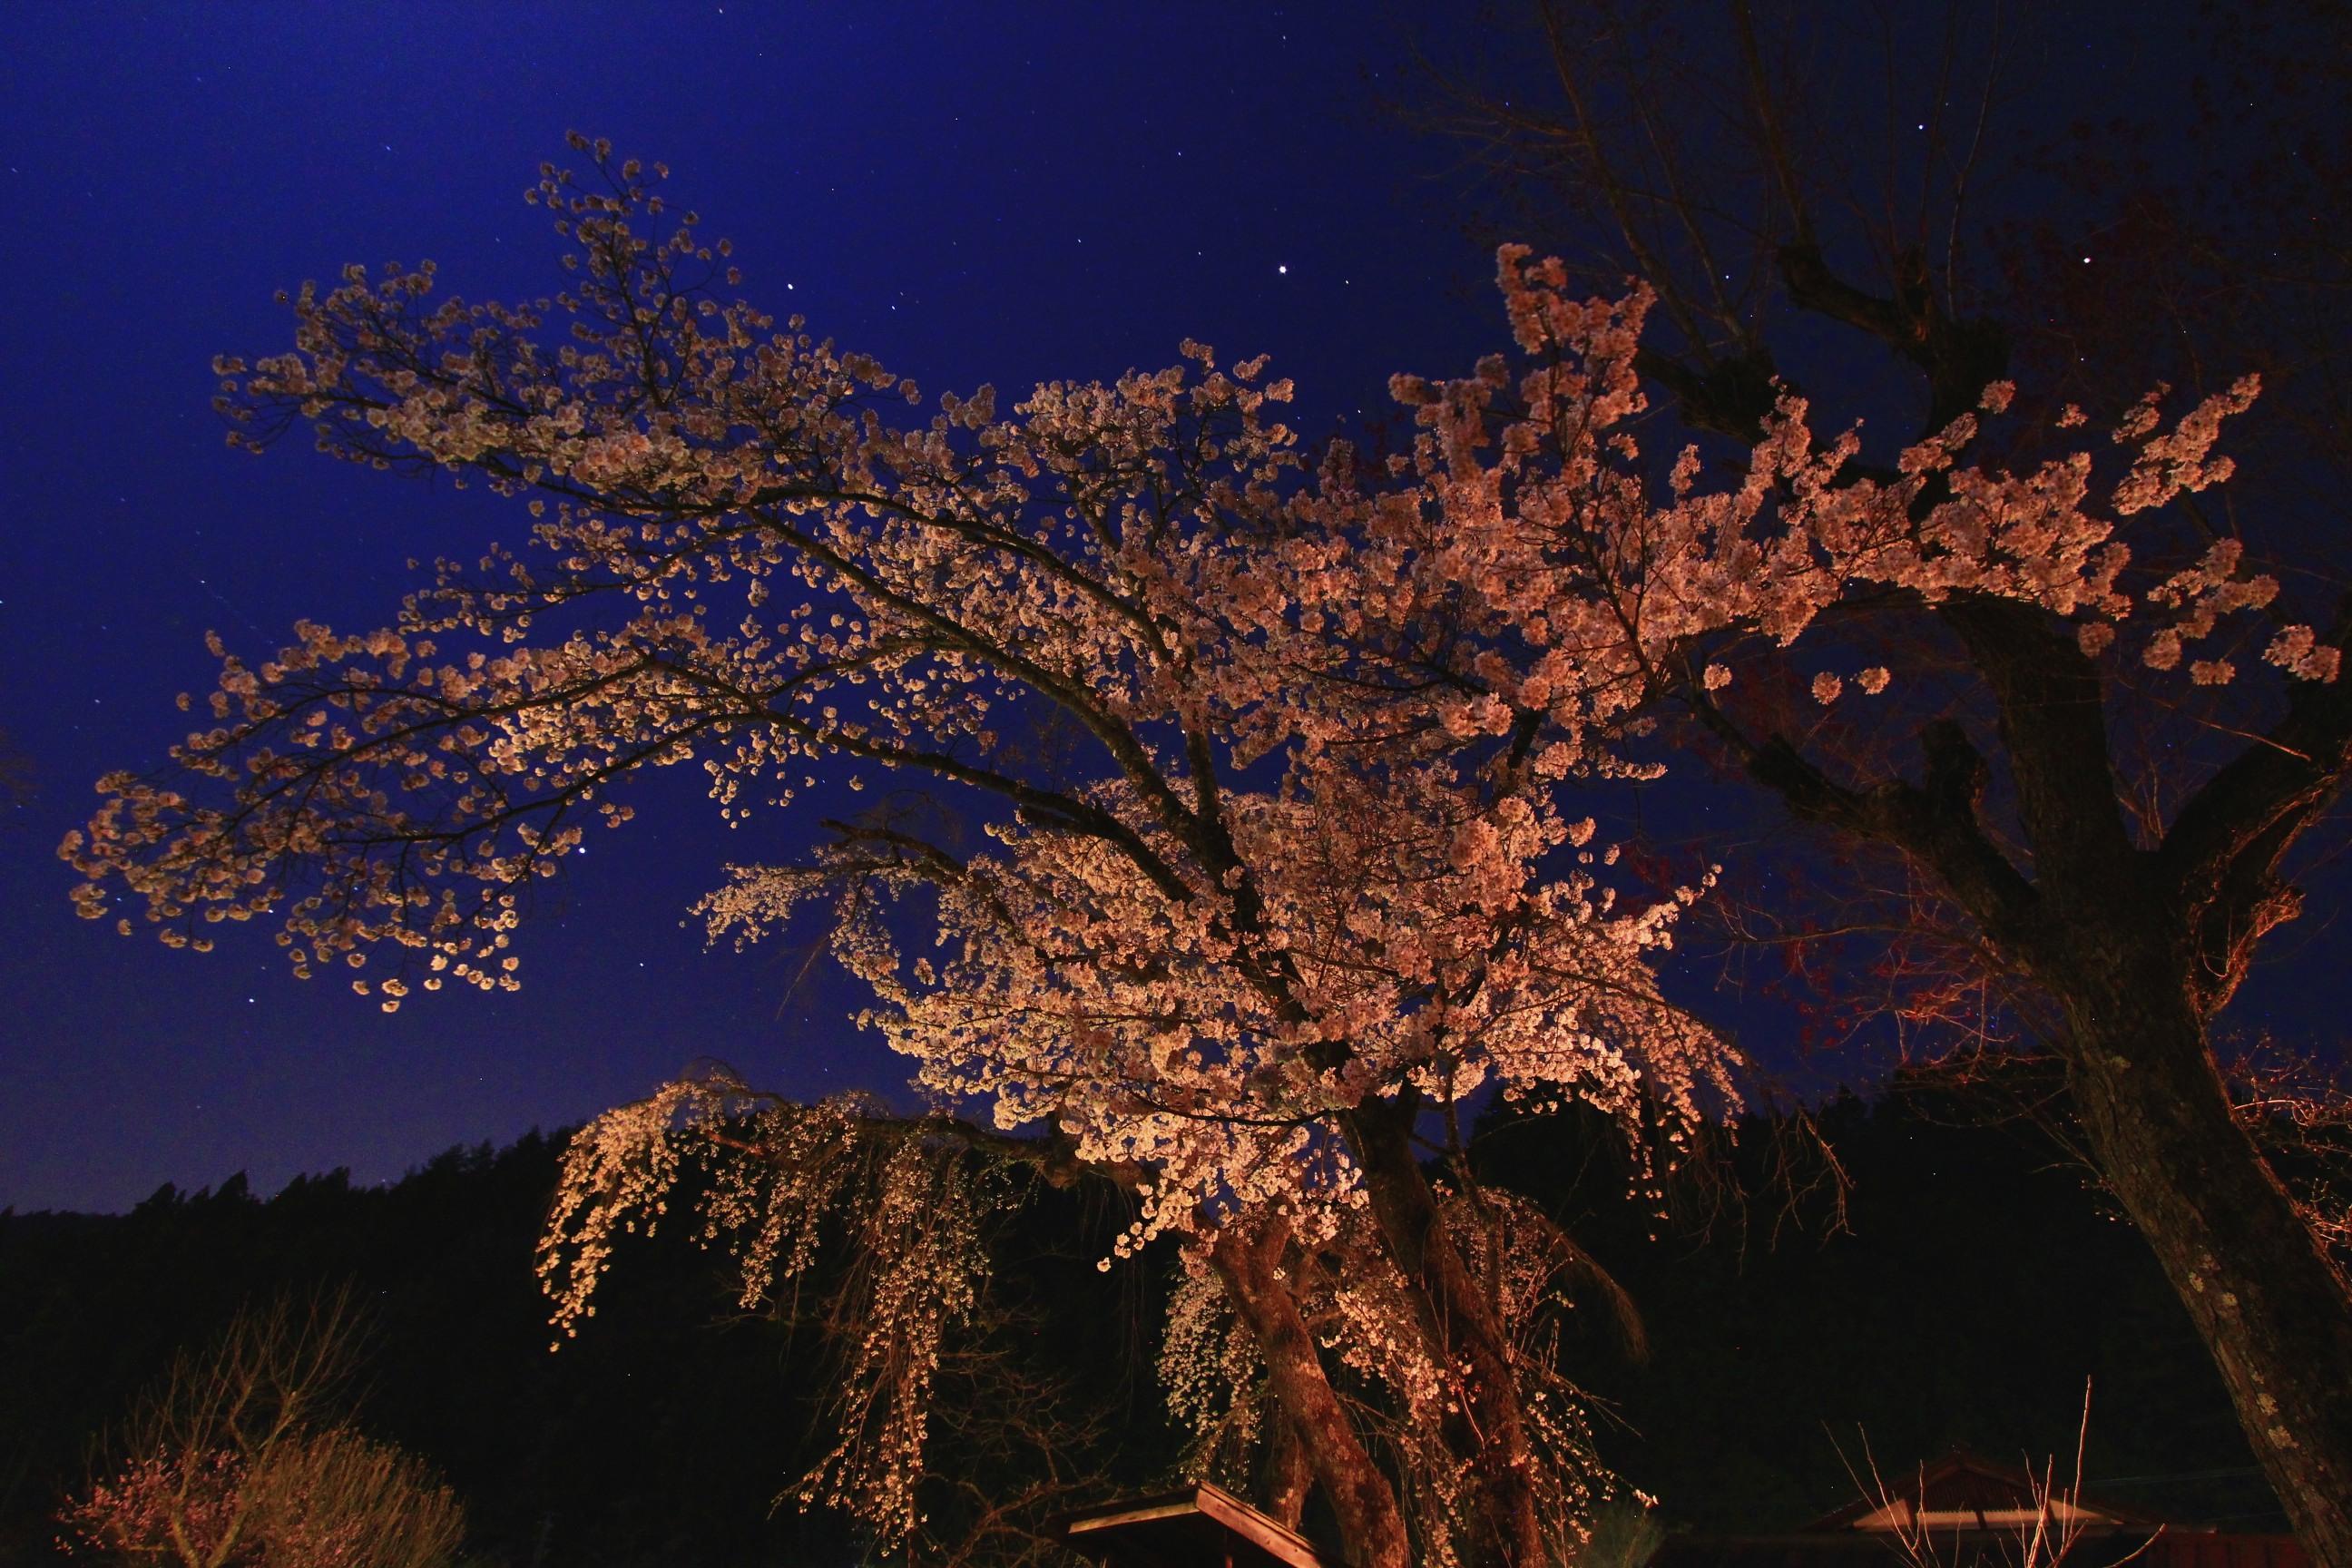 Night Blossom